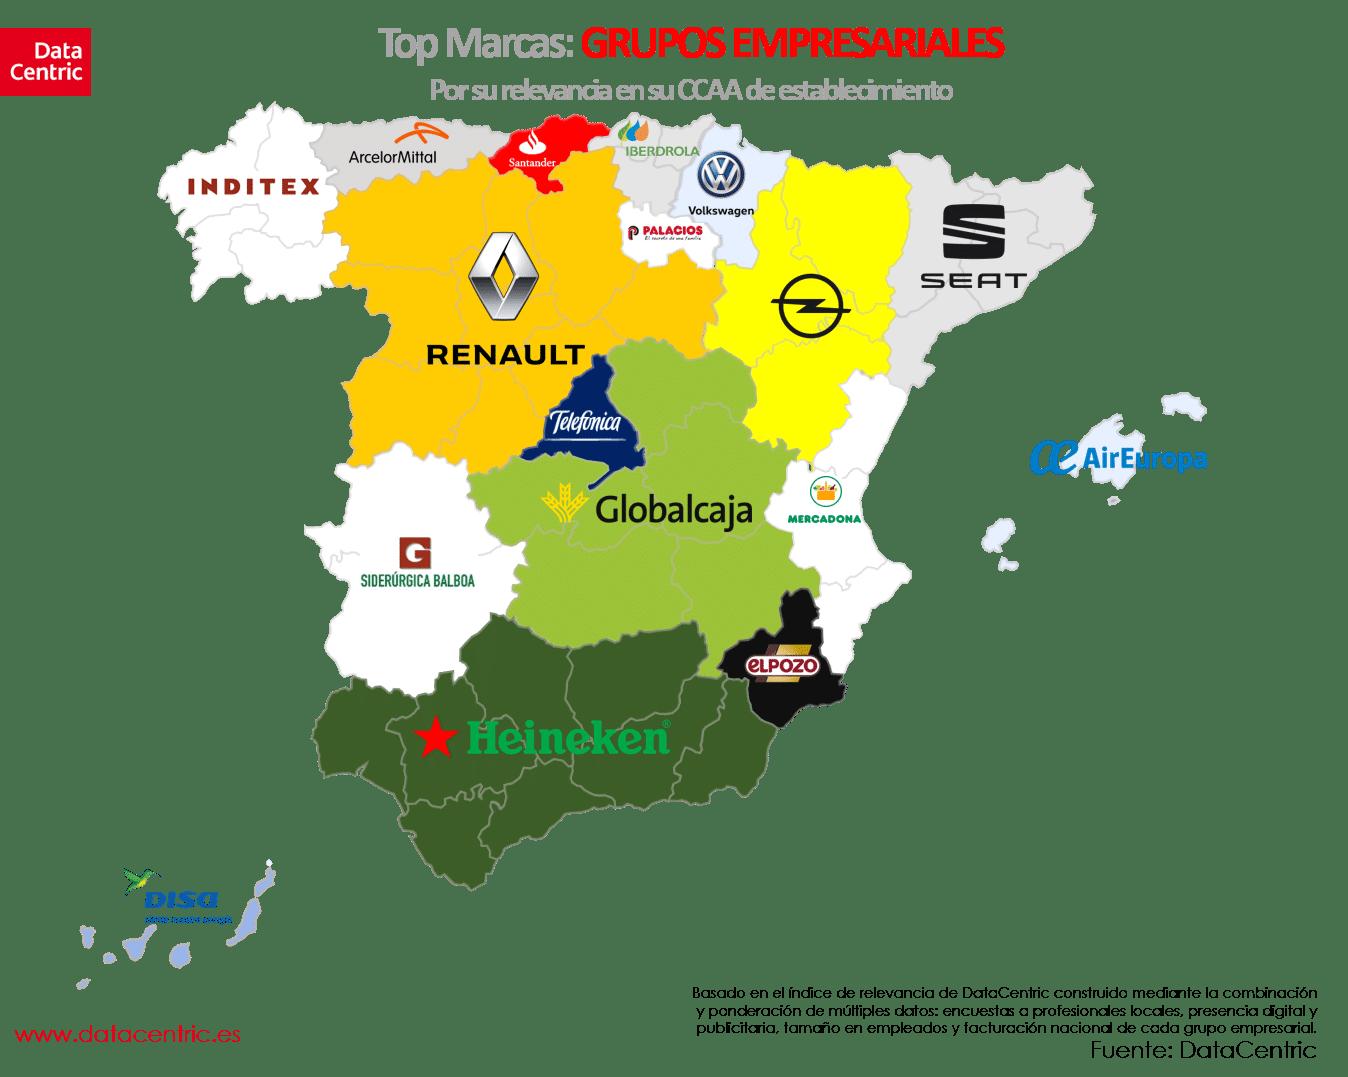 https://blog.globalcaja.es/wp-content/uploads/2019/09/Mapa-top-marcas-por-GRUPO-EMPRESARIAL.png